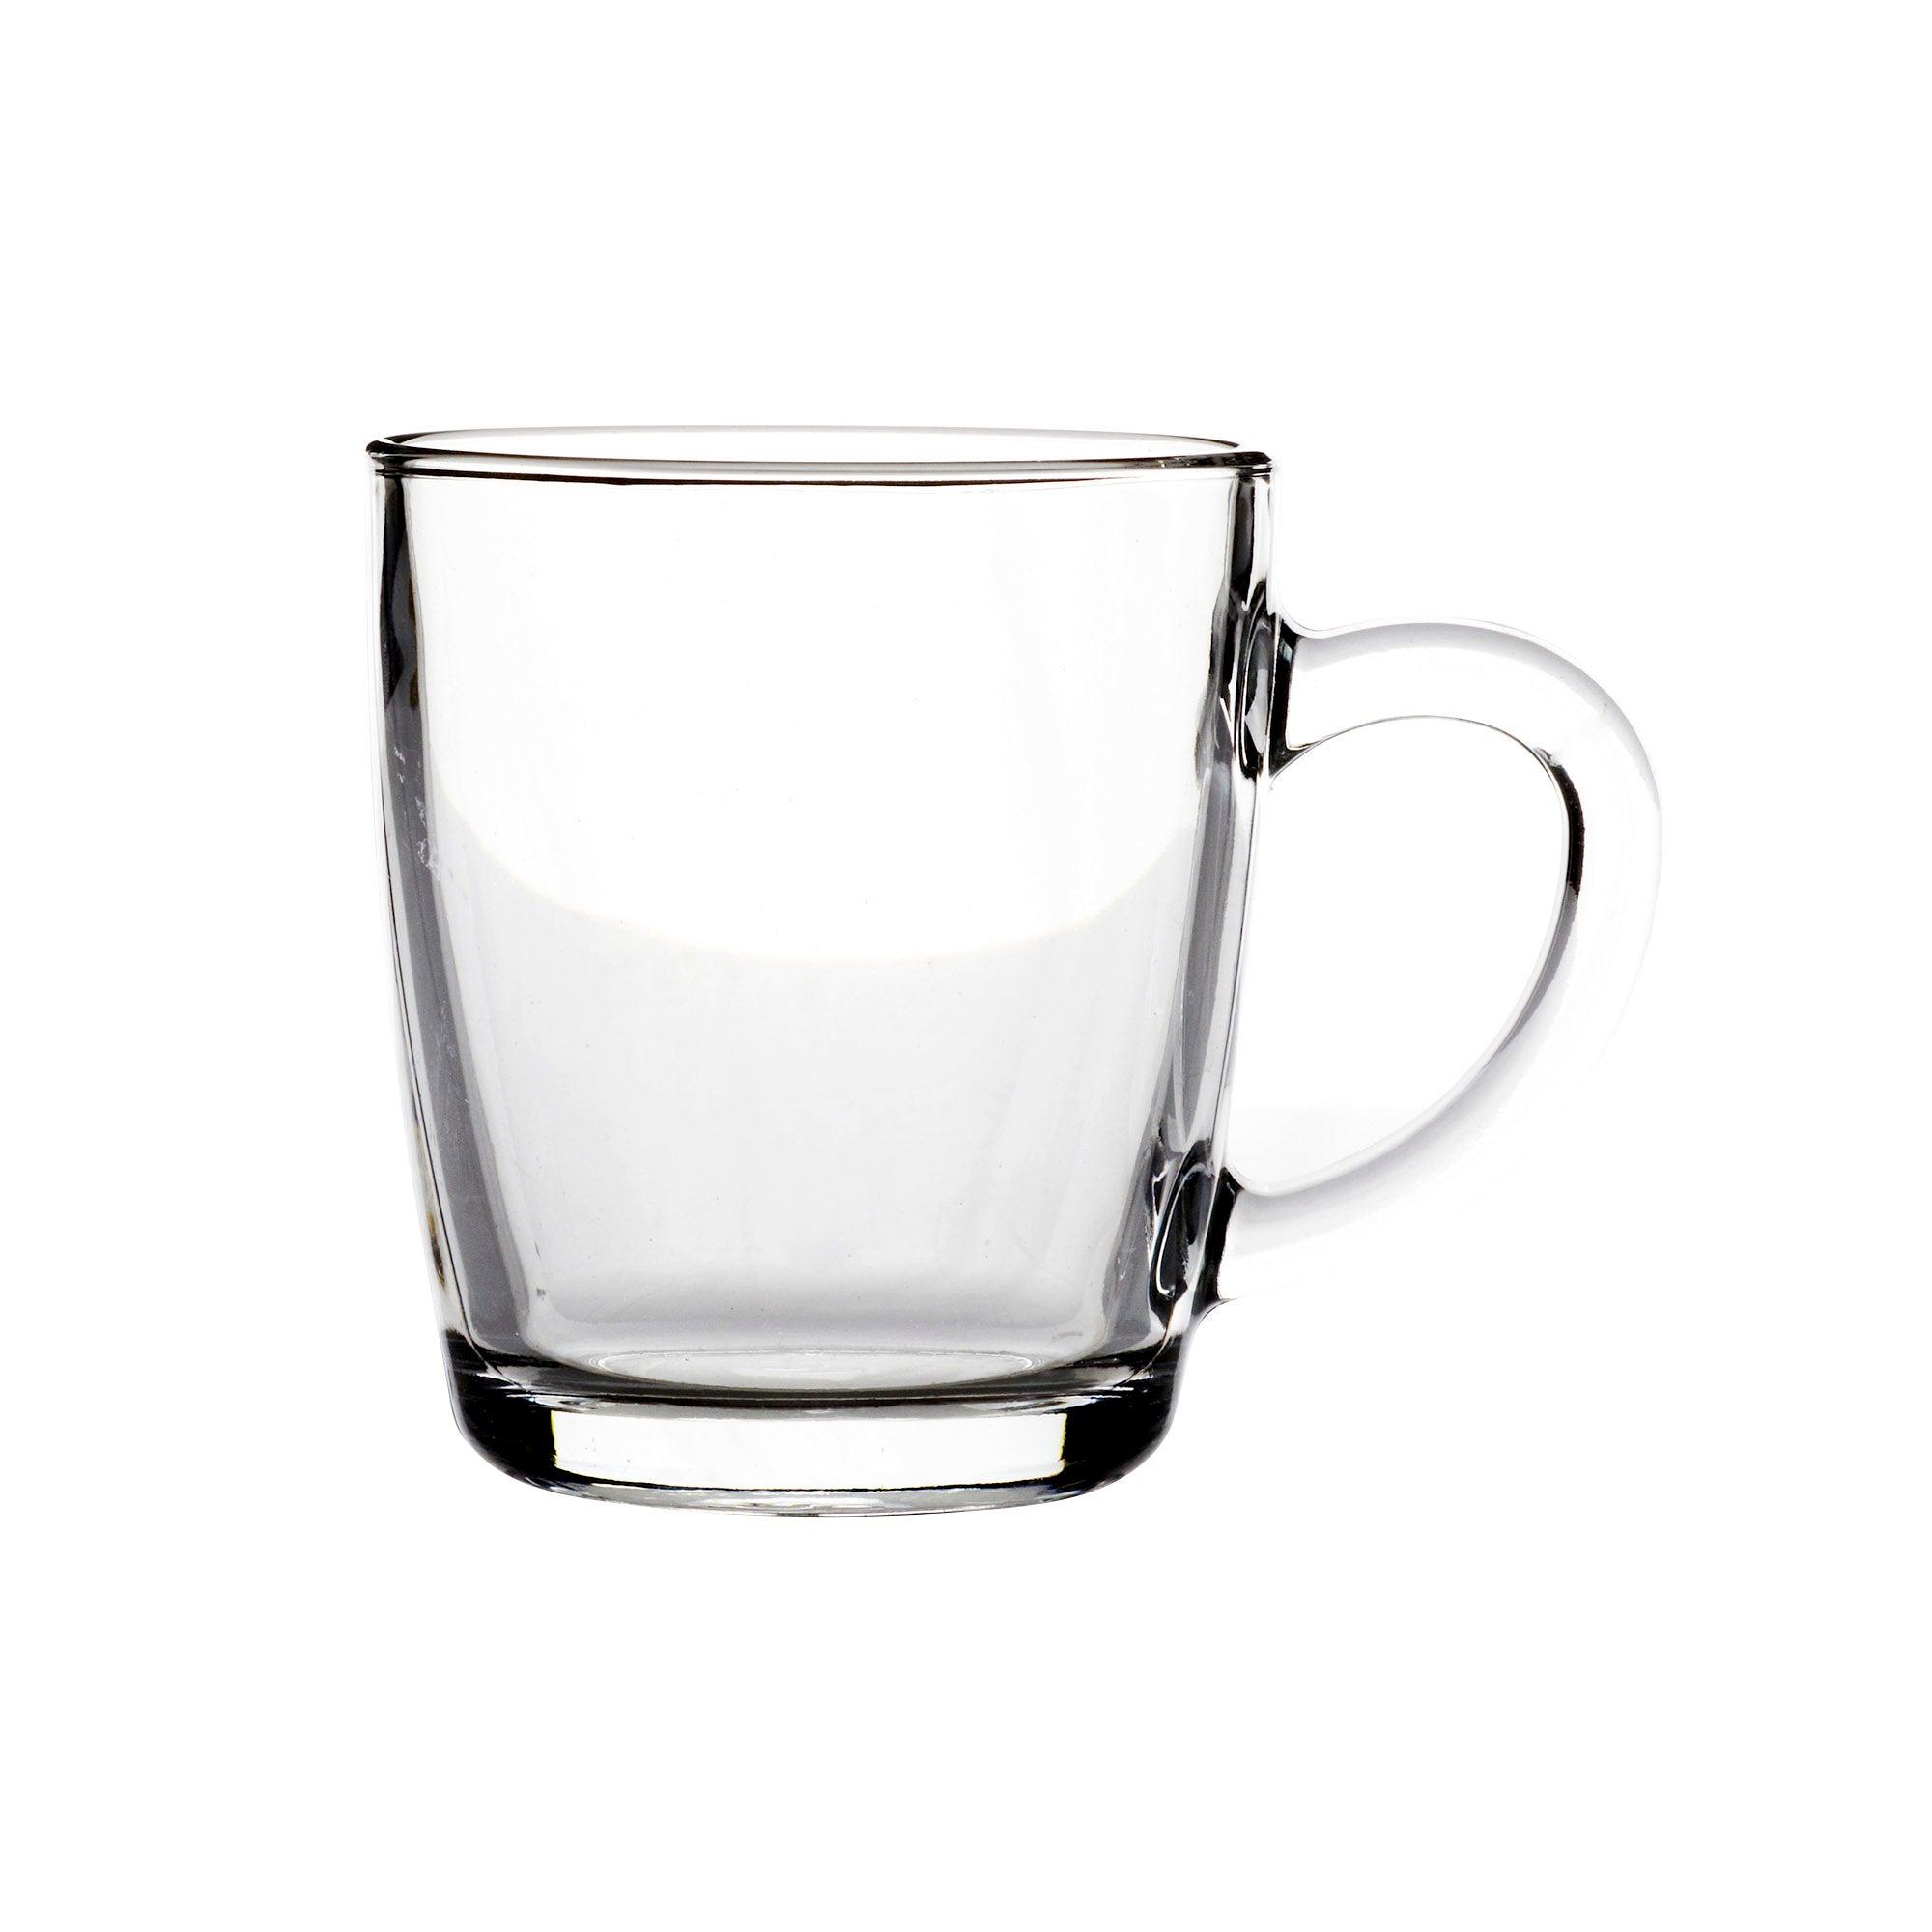 Handled Tea Mug